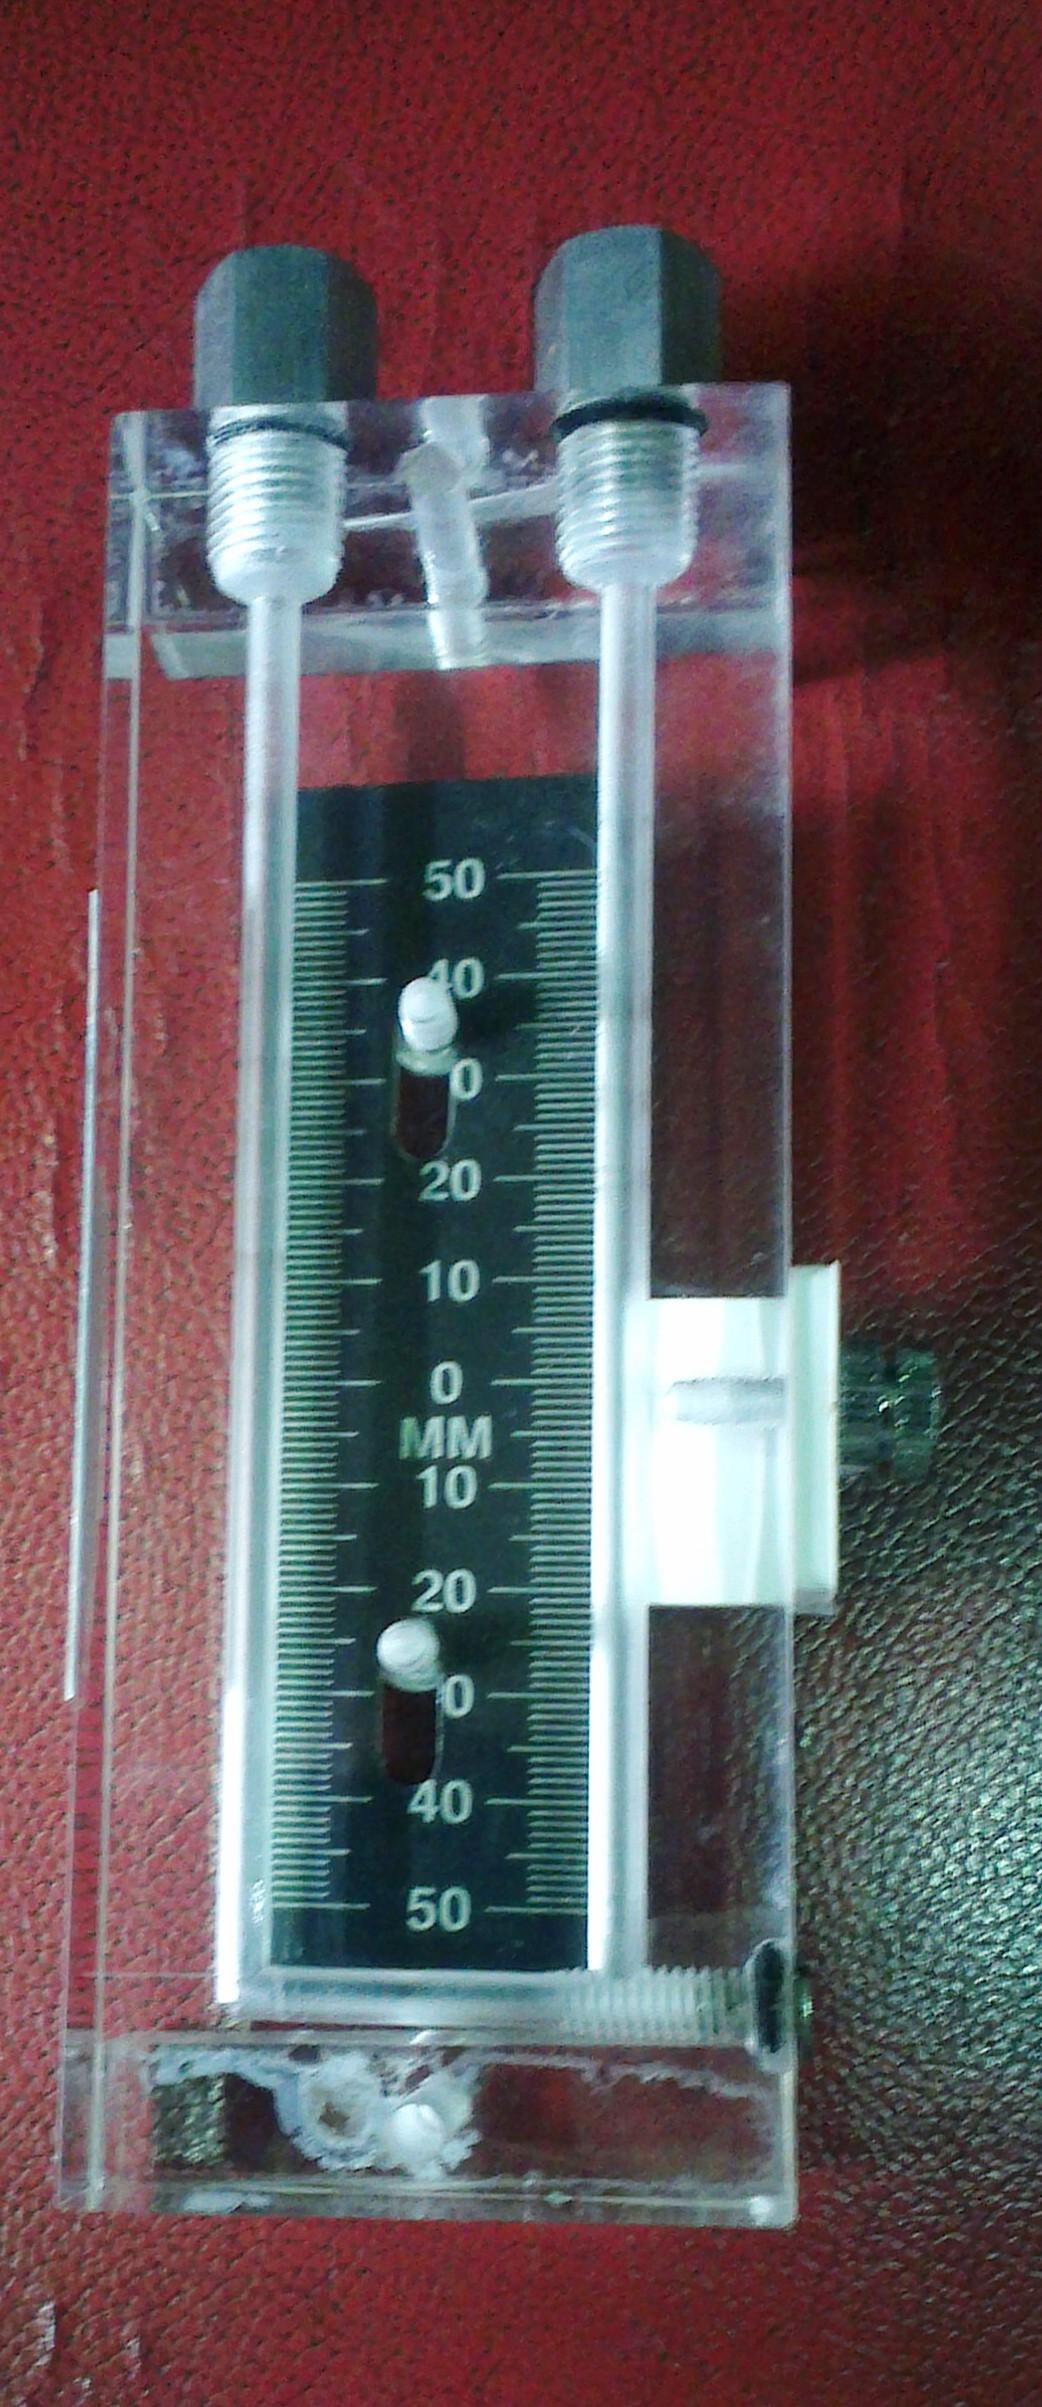 U-Tube manometer manufacturers